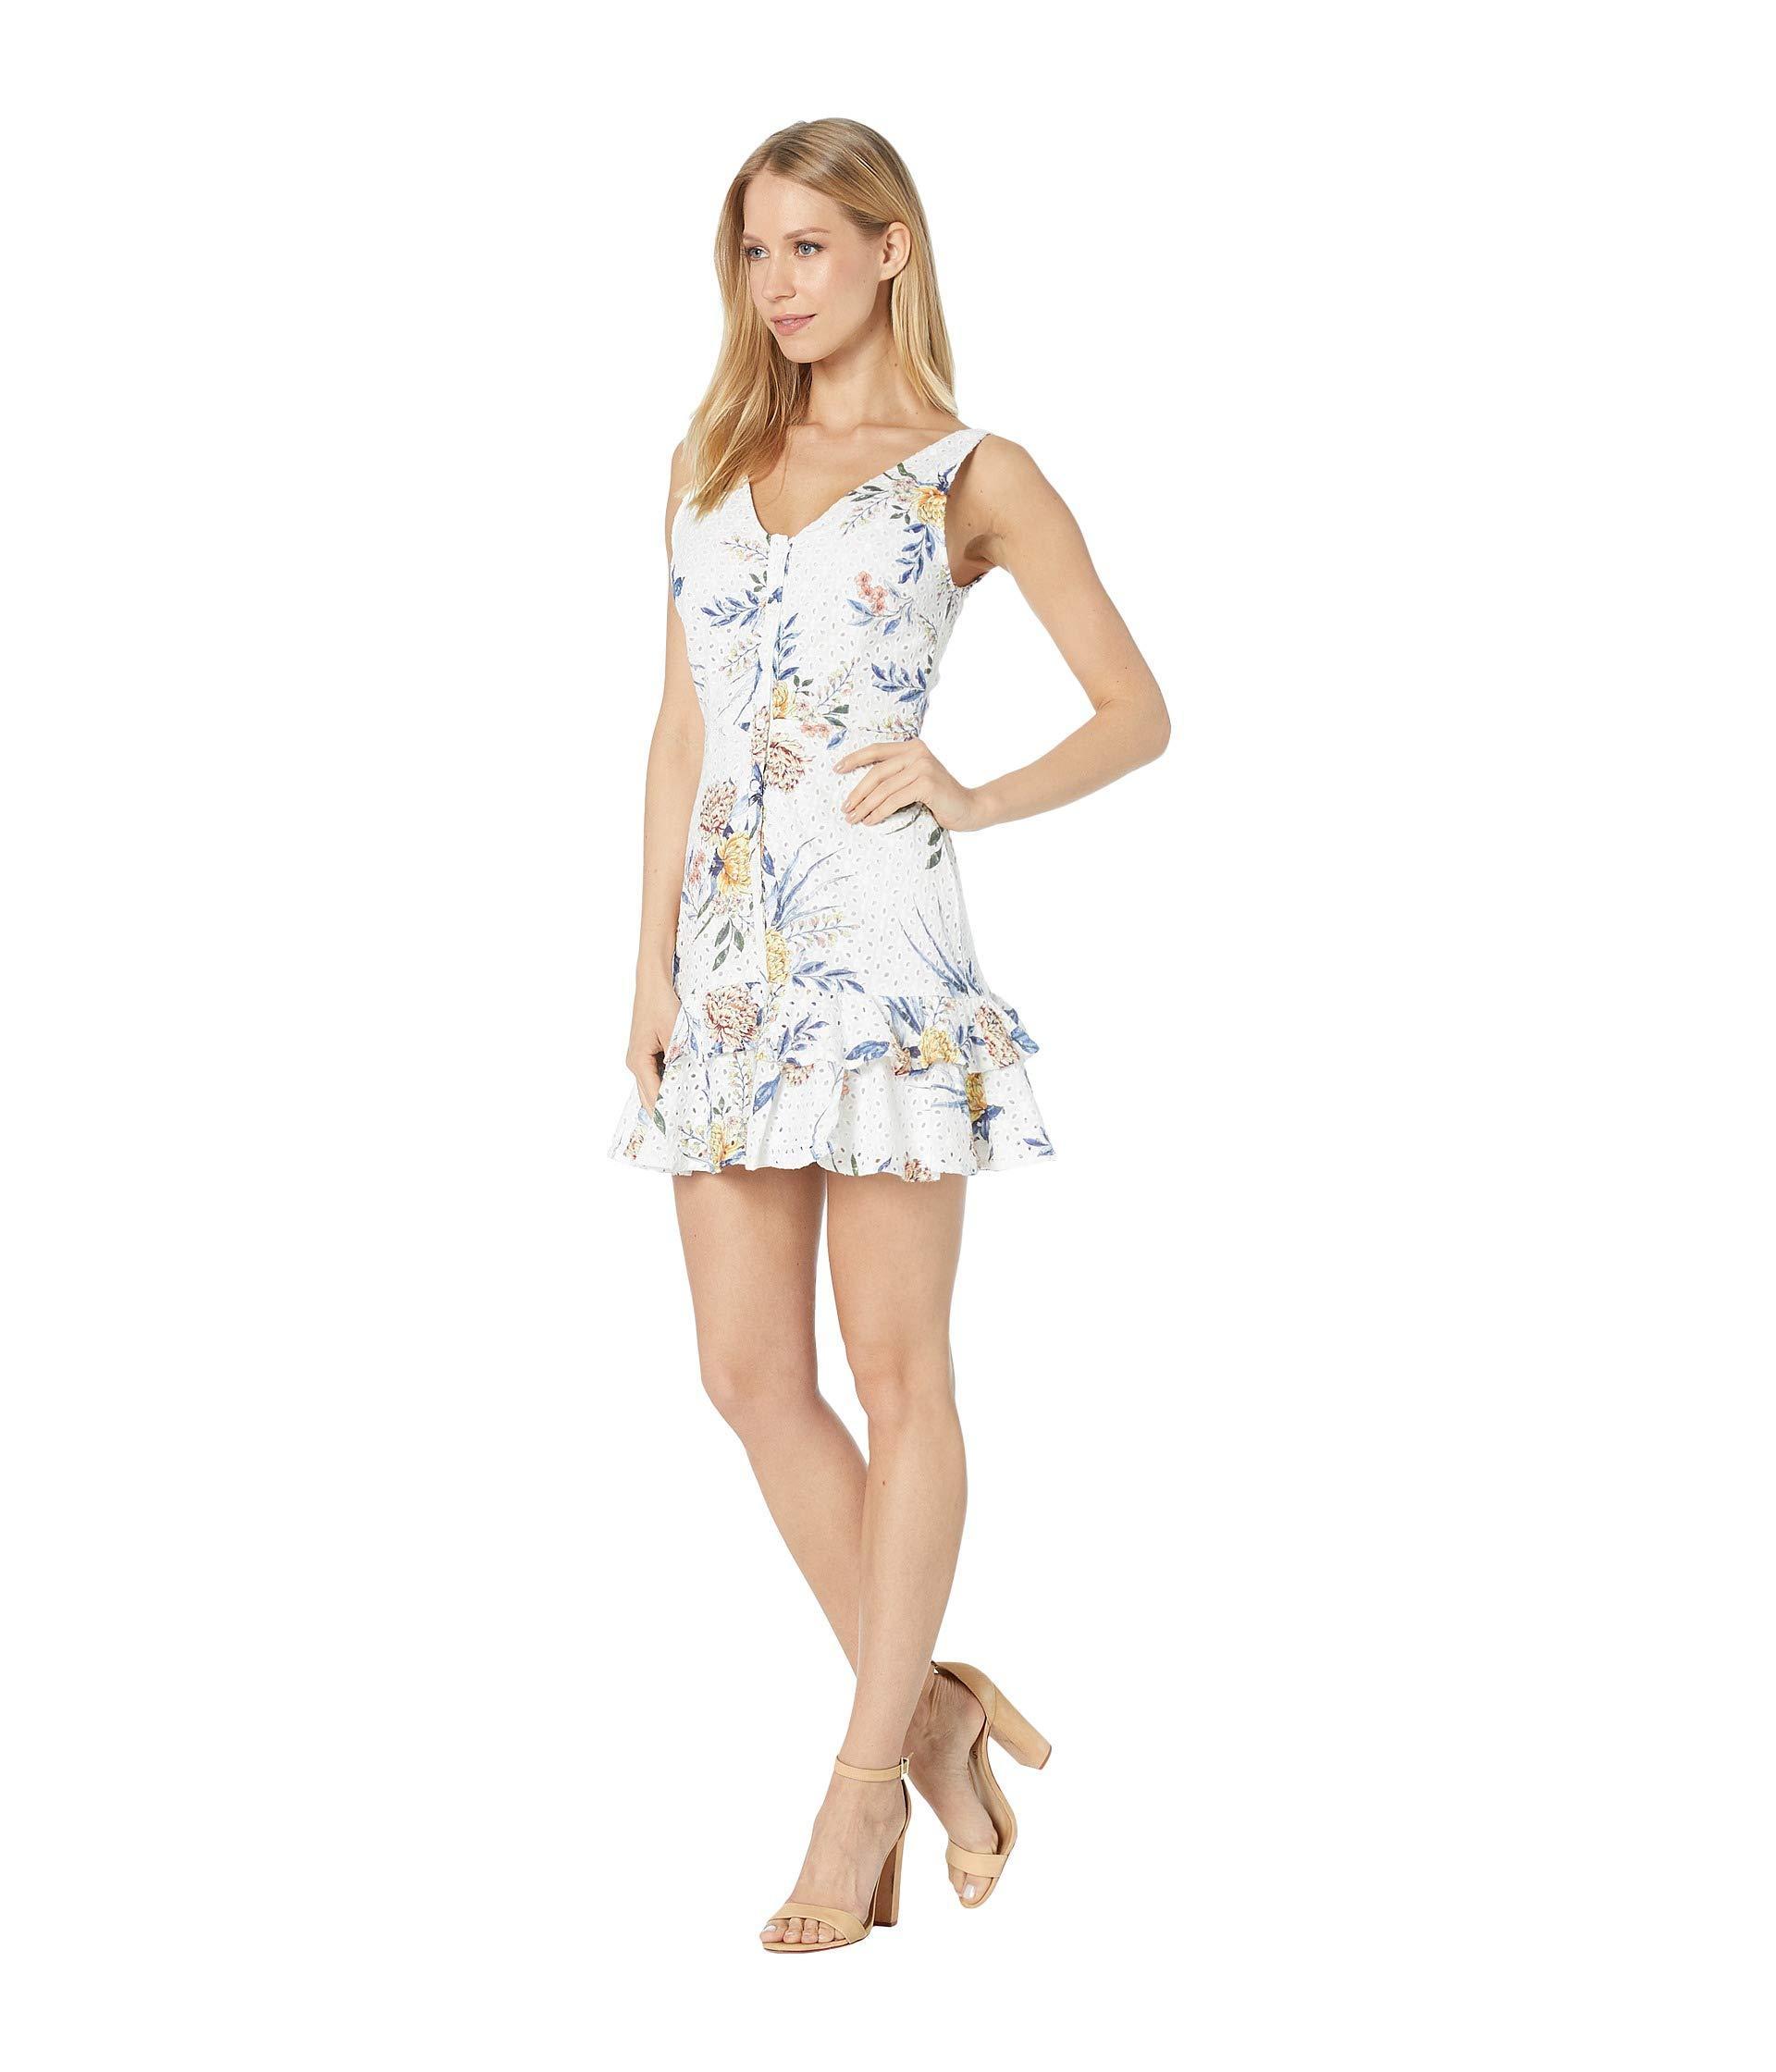 4a875bedcc1 BB Dakota Turn Up The Heat Dress (optic White) Women s Dress in White - Lyst